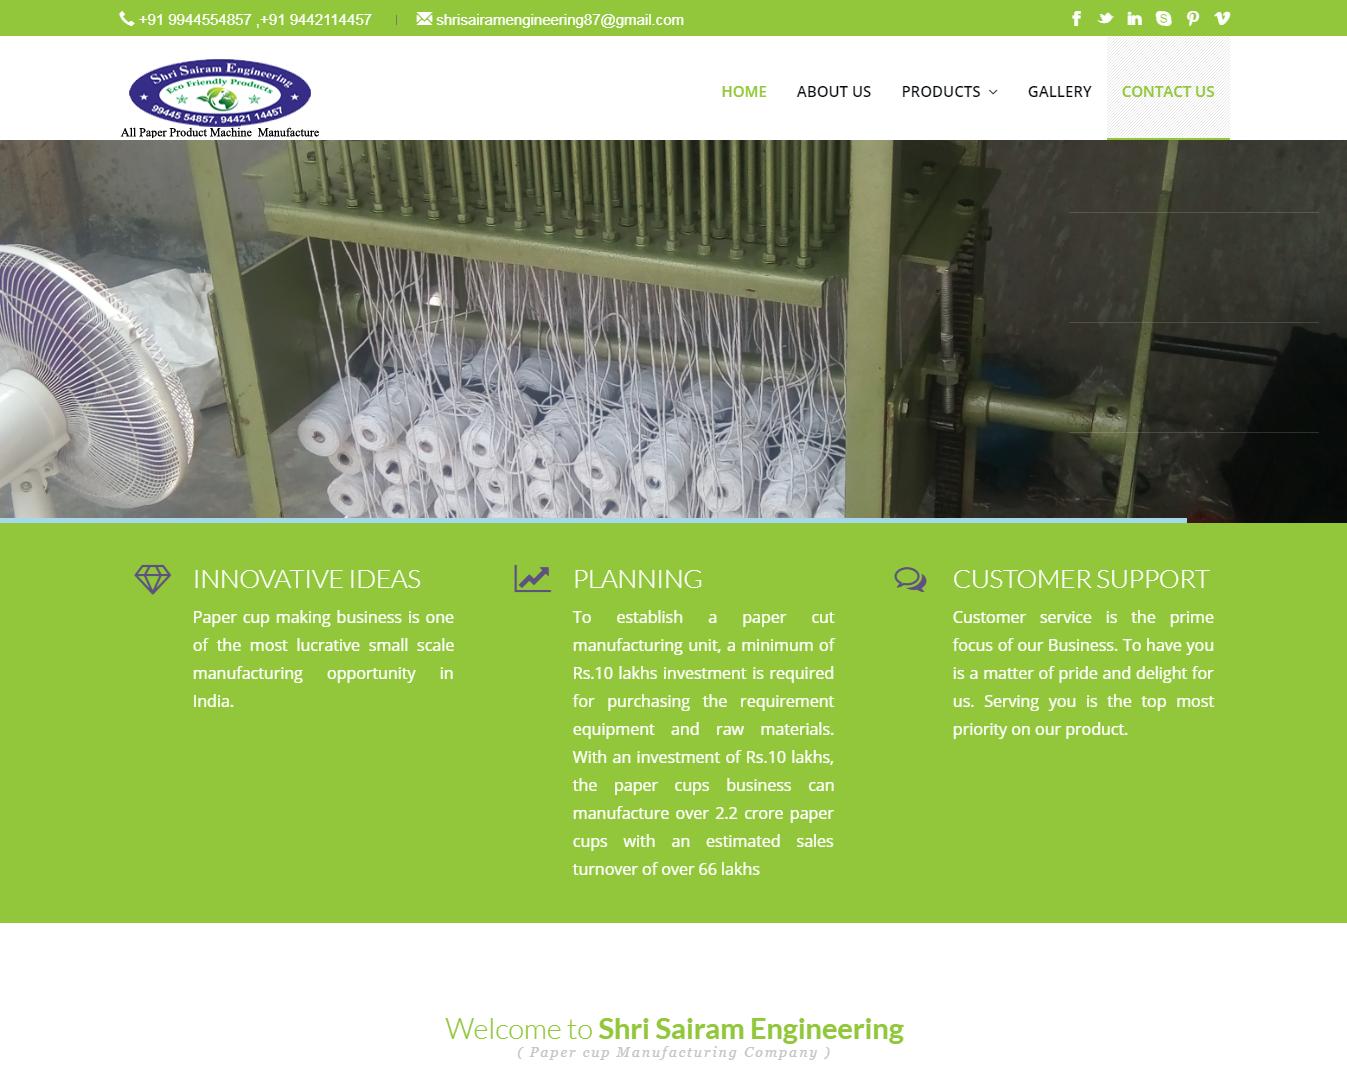 Shri Sairam Engineering